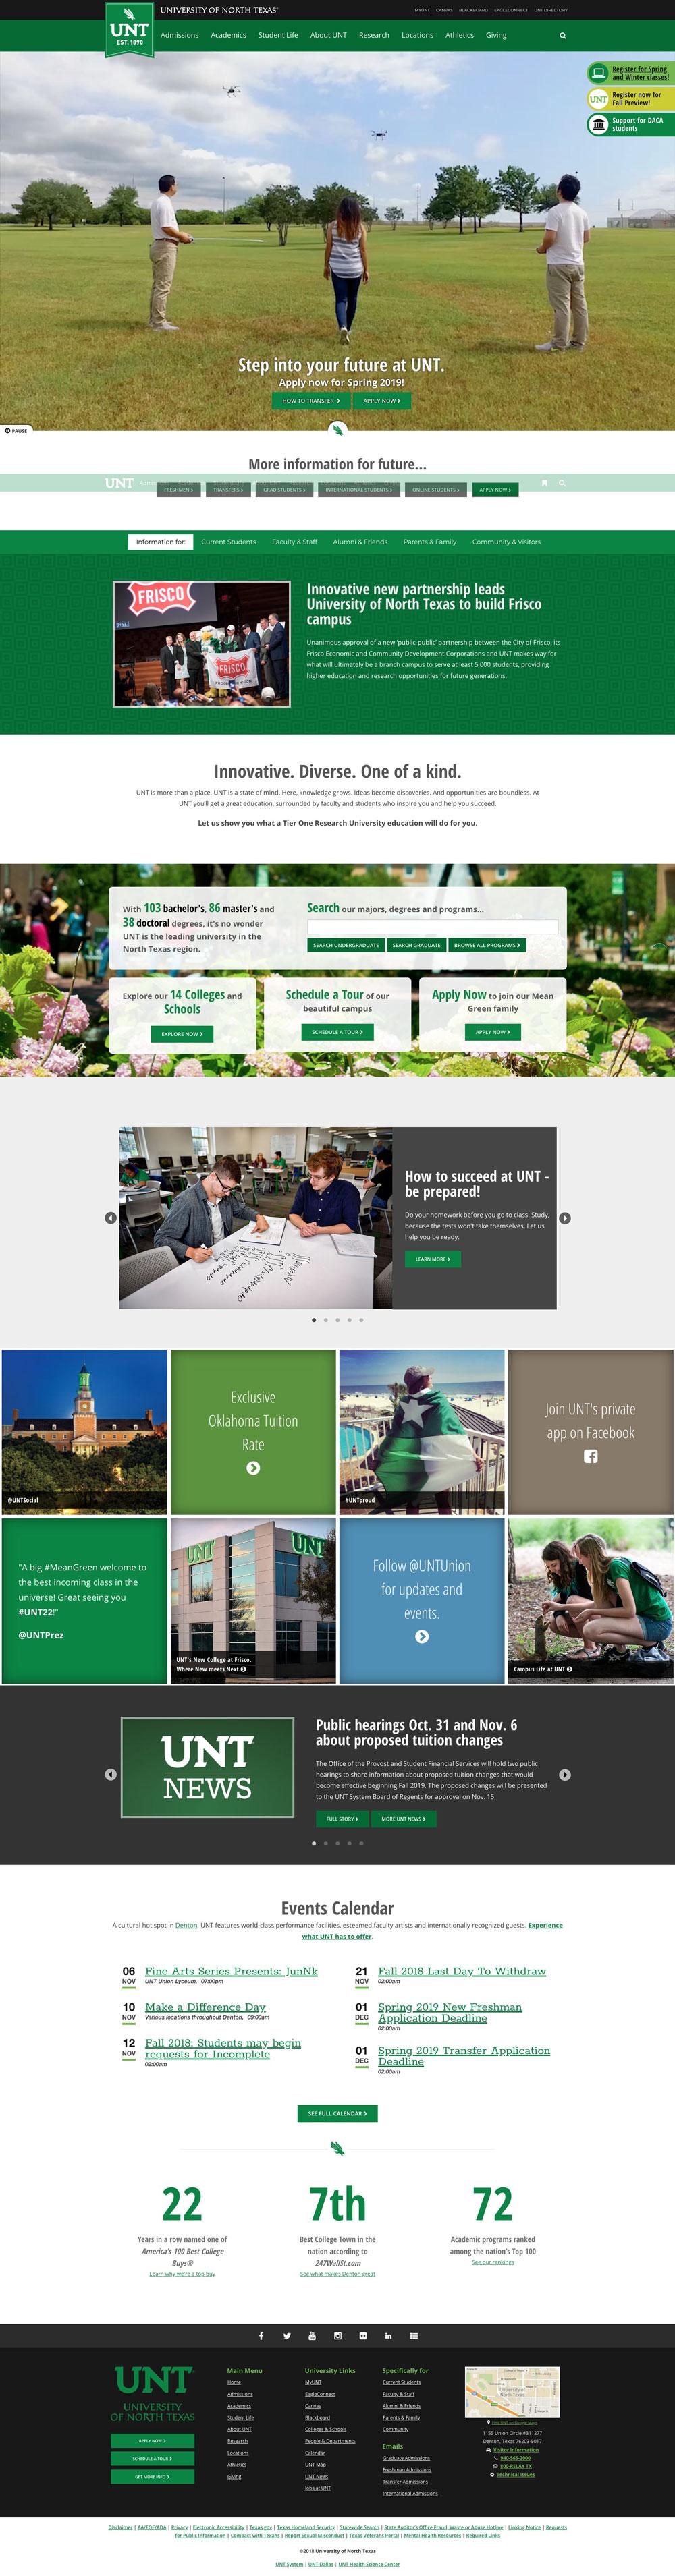 UNT Homepage